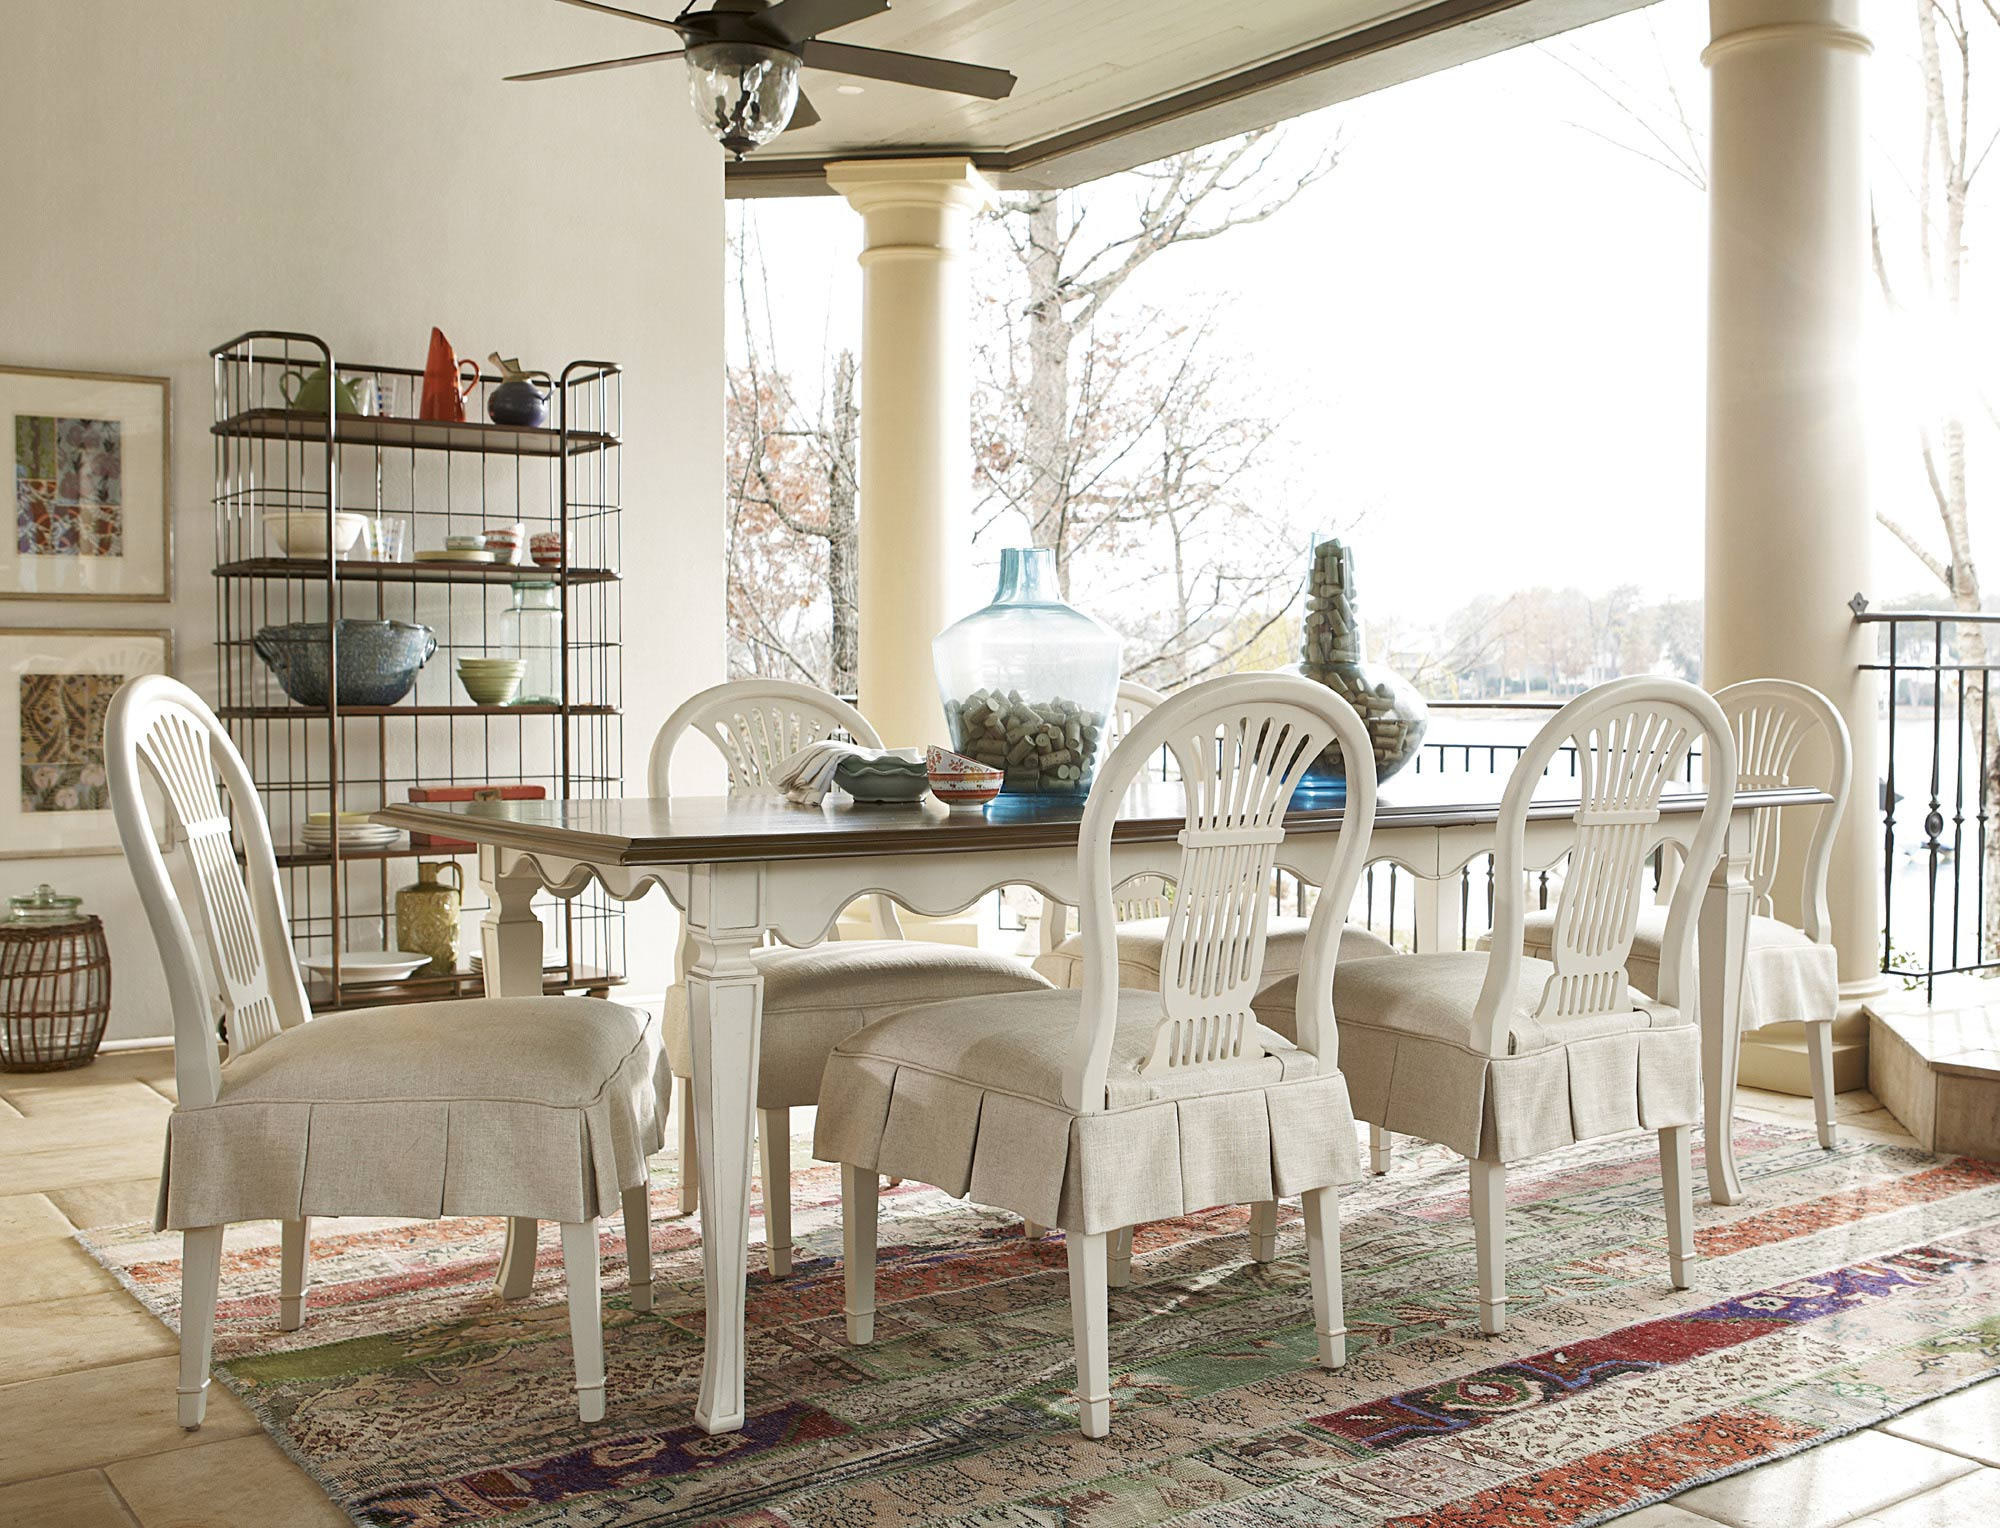 Cordevalle Rectangular Leg Dining Room Set | Universal | Home Gallery Stores